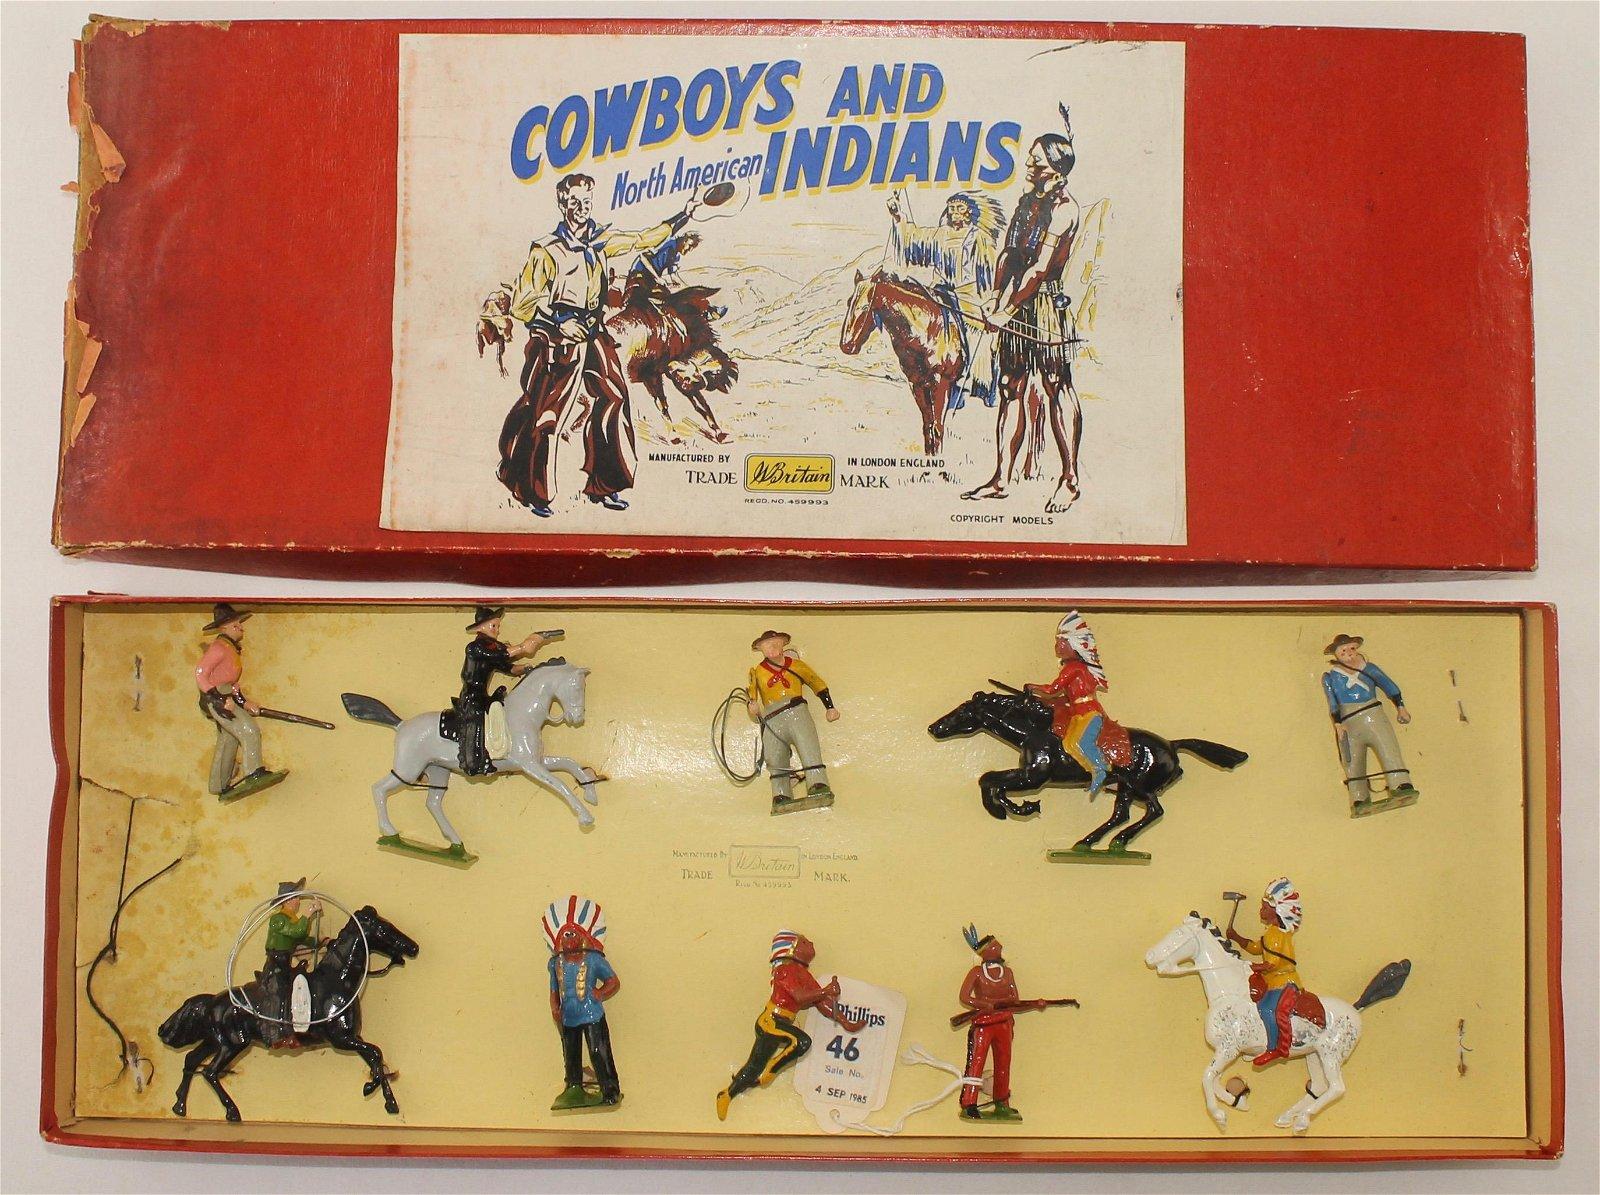 Britains Set #272 North American Indians Cowboys